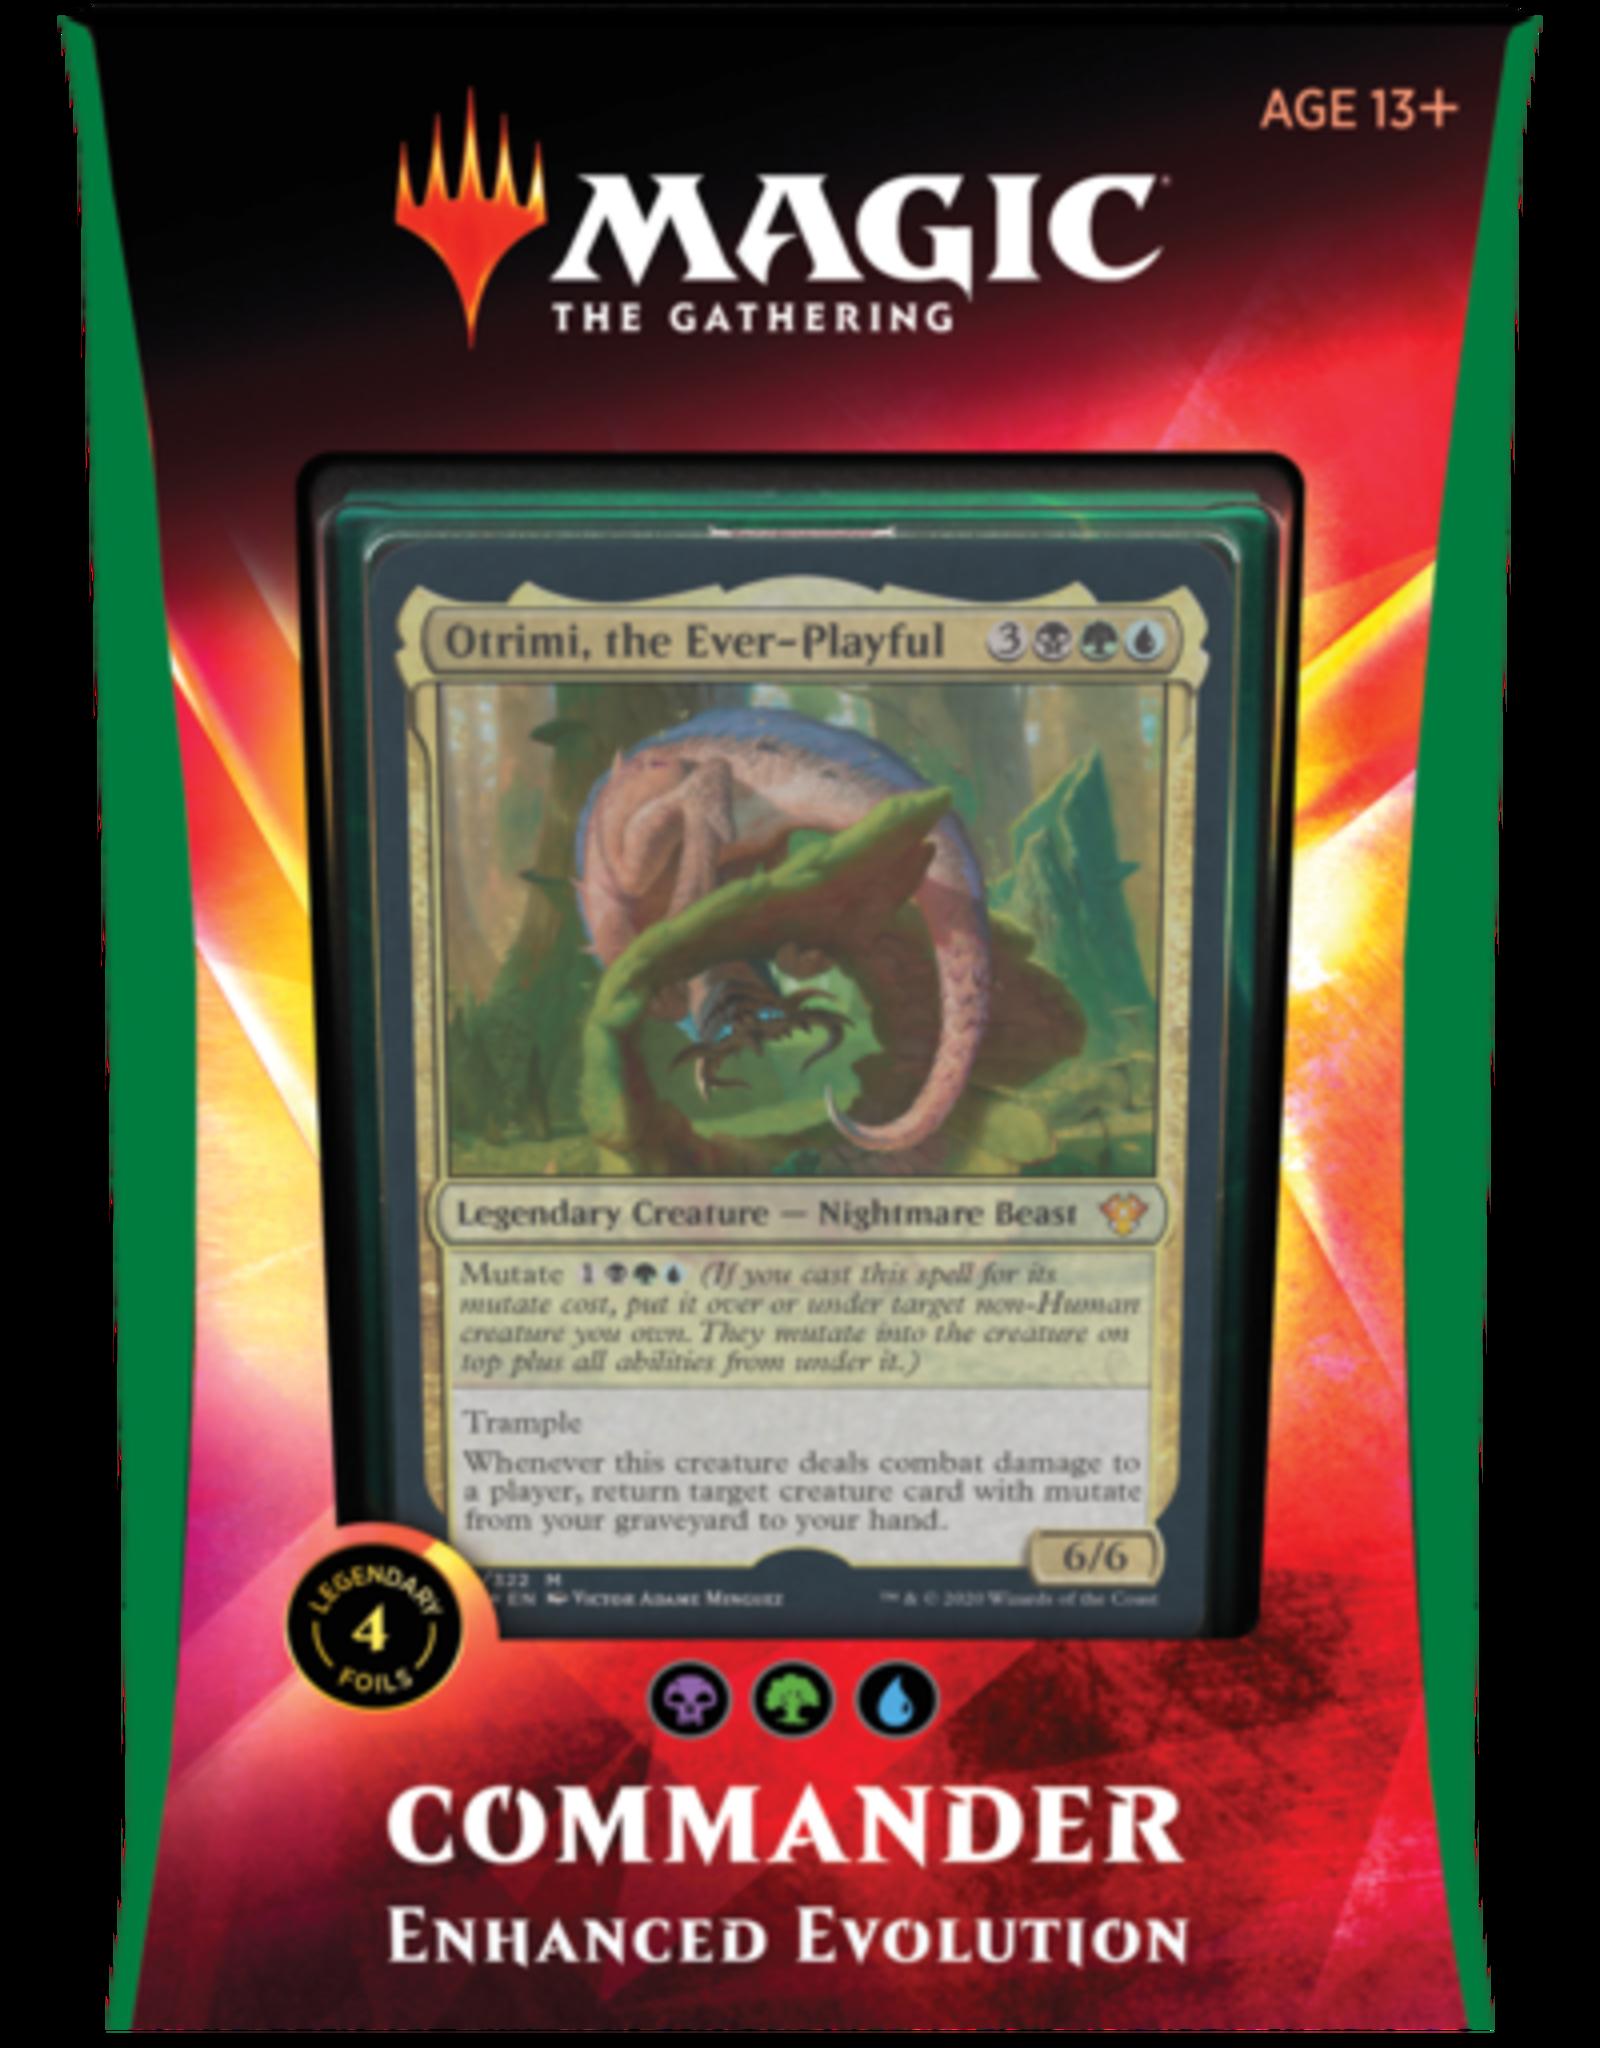 Magic: The Gathering CCG MAGIC THE GATHERING: IKORIA: LAIR OF BEHEMOTHS COMMANDER Deck: Enhanced Evolution